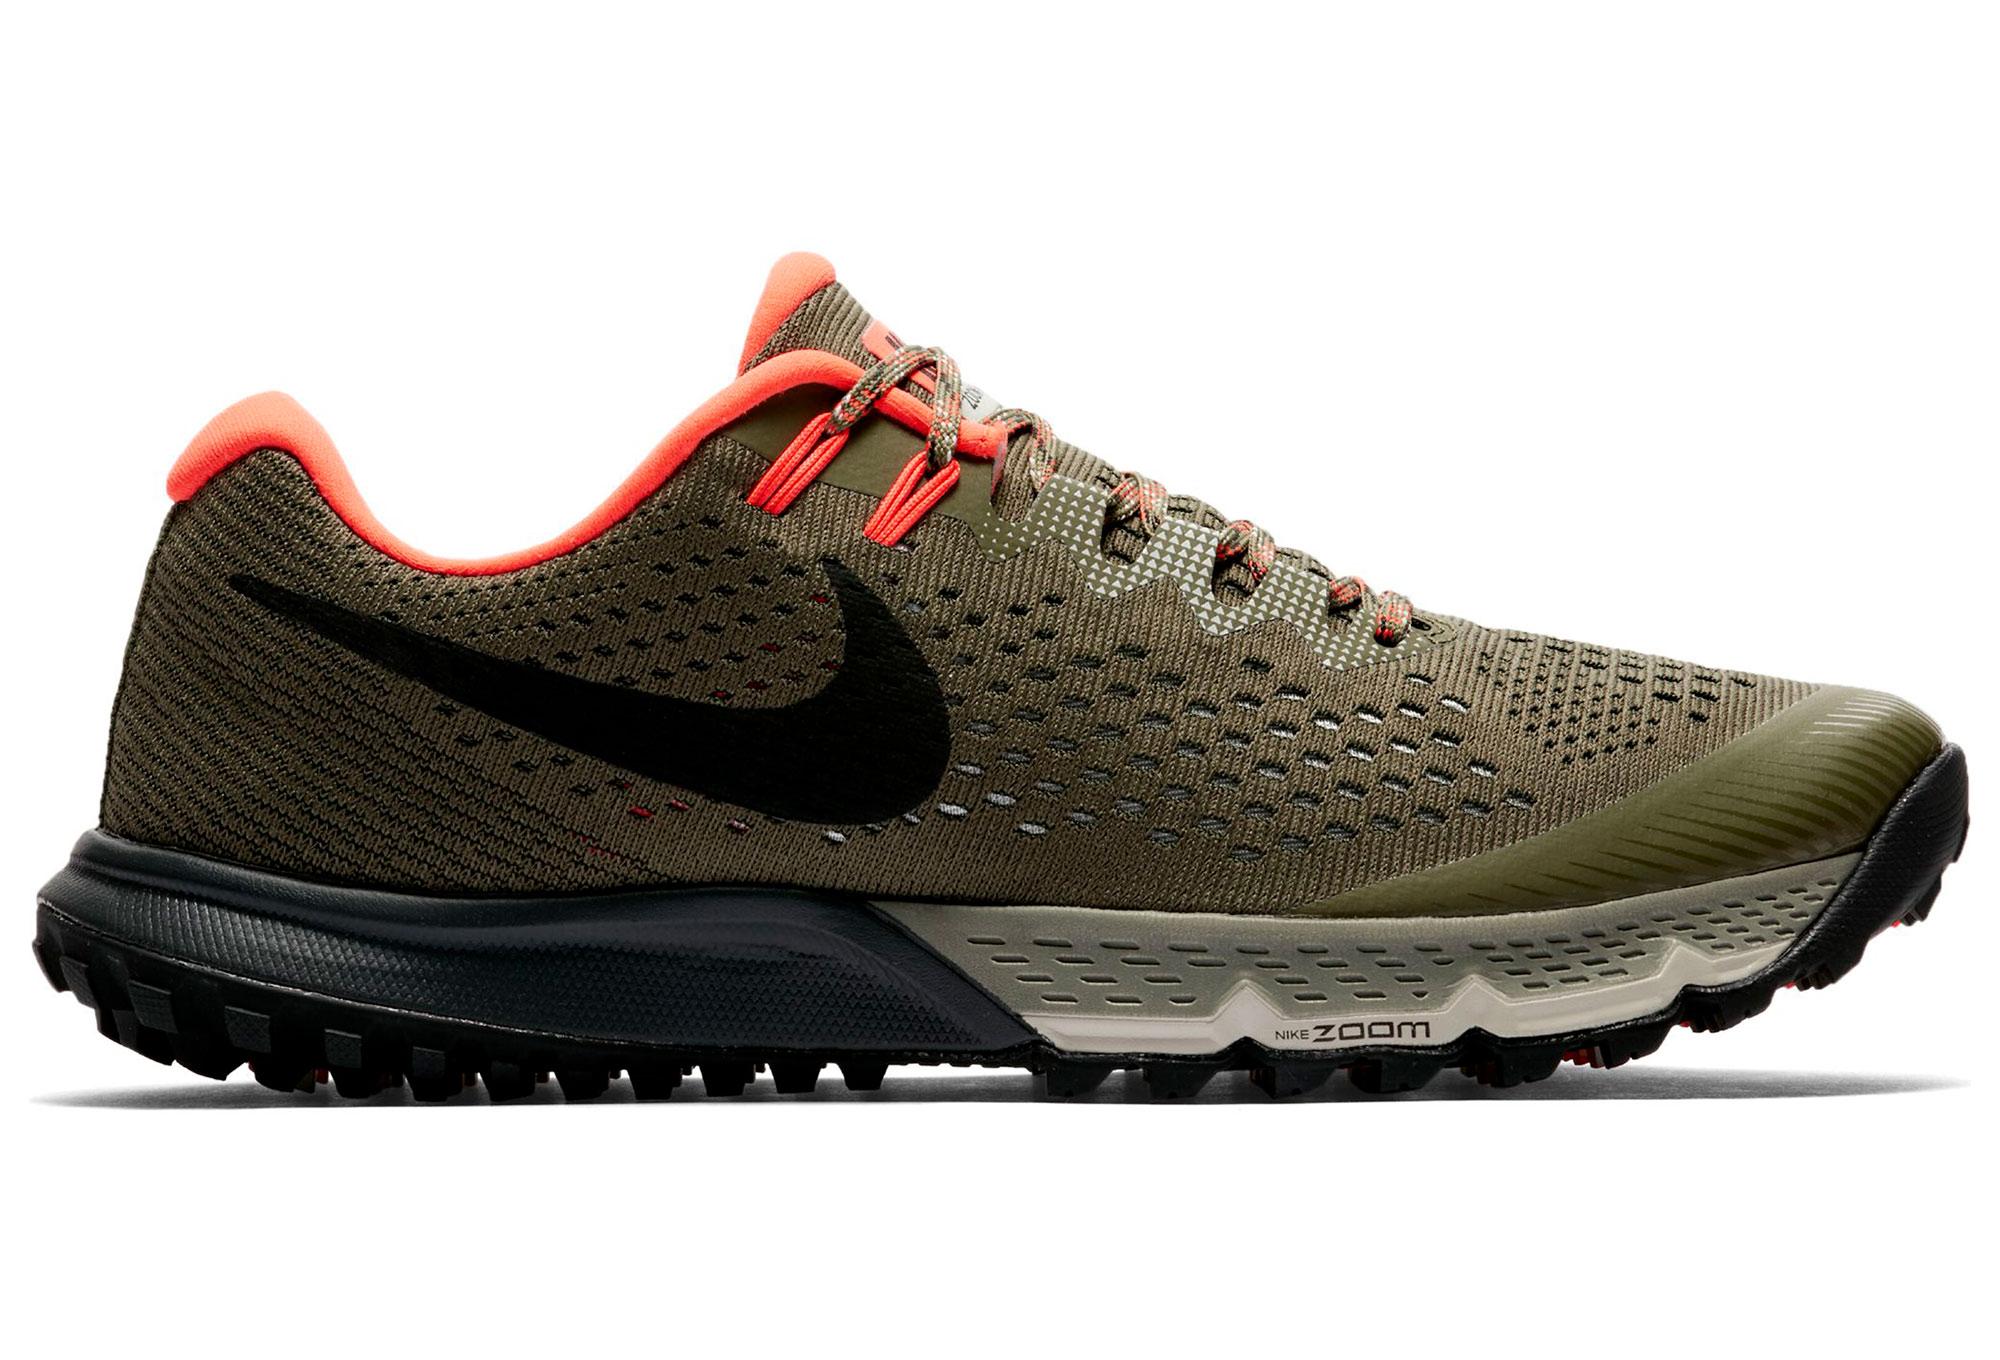 e9baf2154f8a1 Nike Shoes Air Zoom terra Kiger 4 Khaki Orange Men